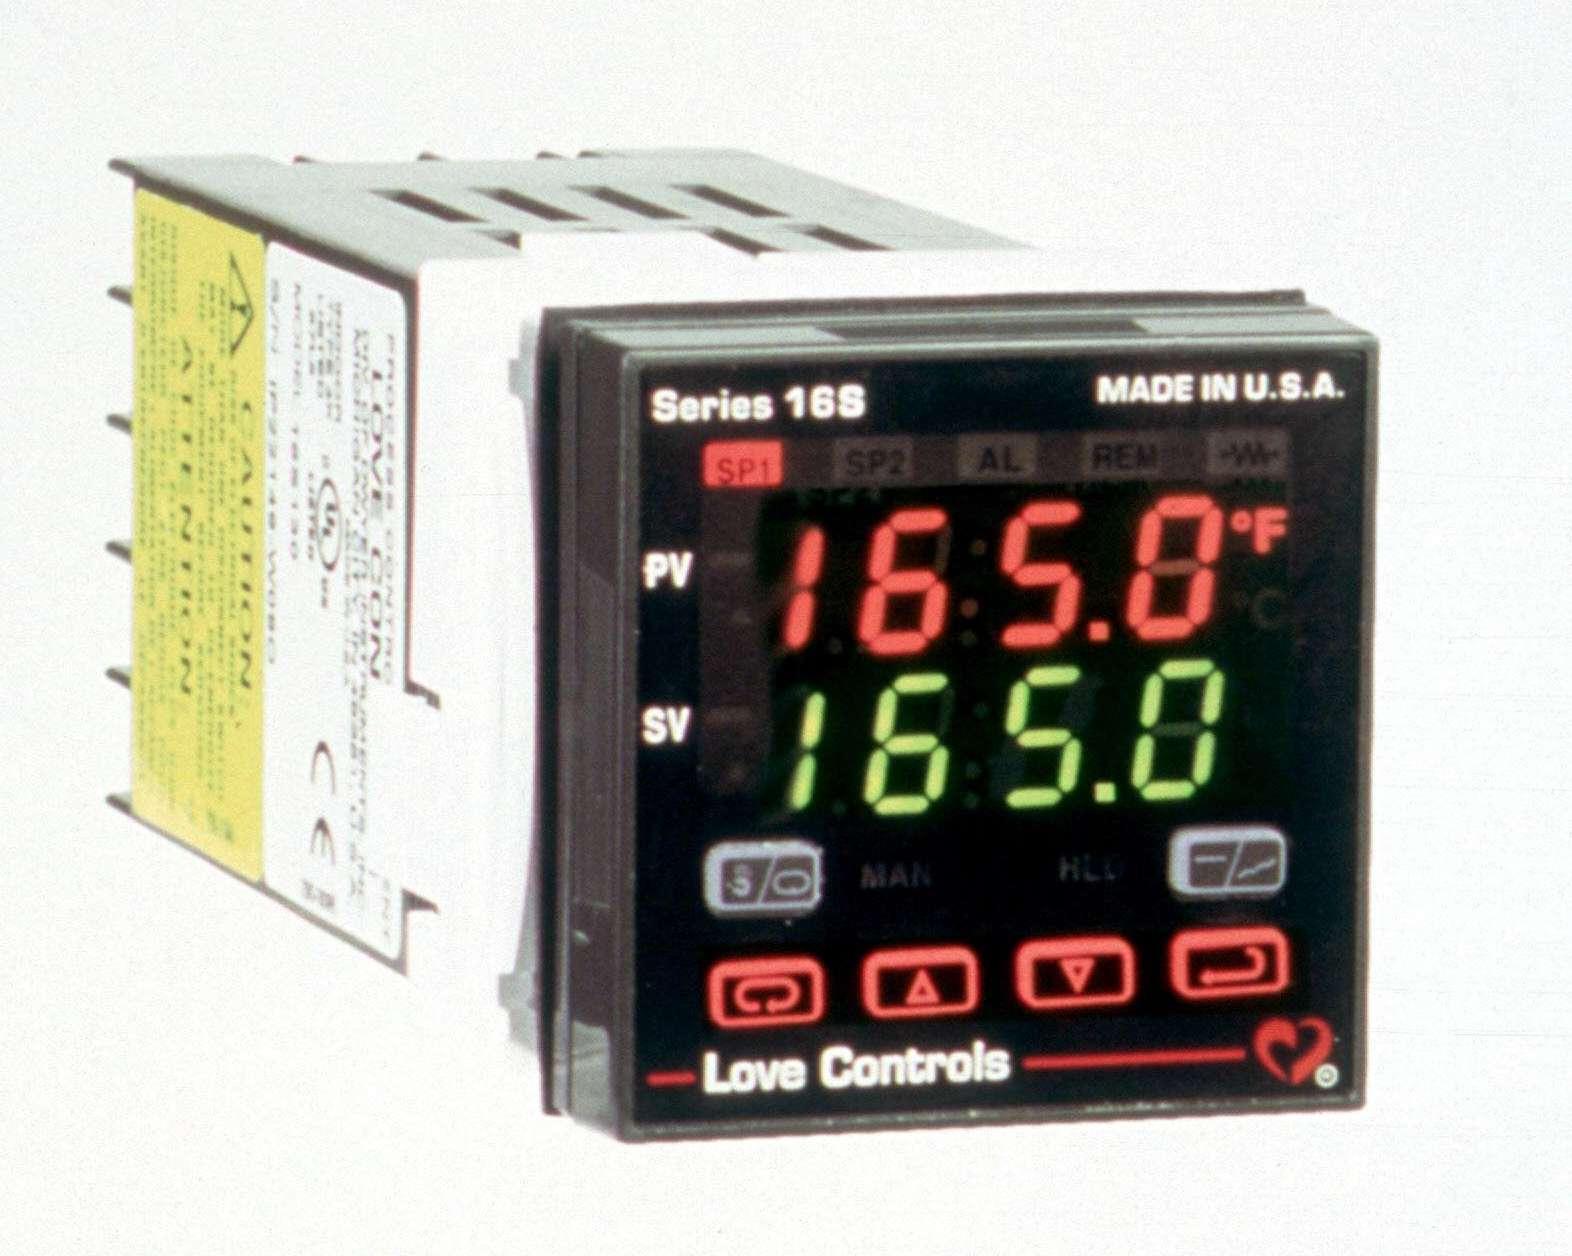 Temperature/Process Control includes assured soak capability. #AE291D